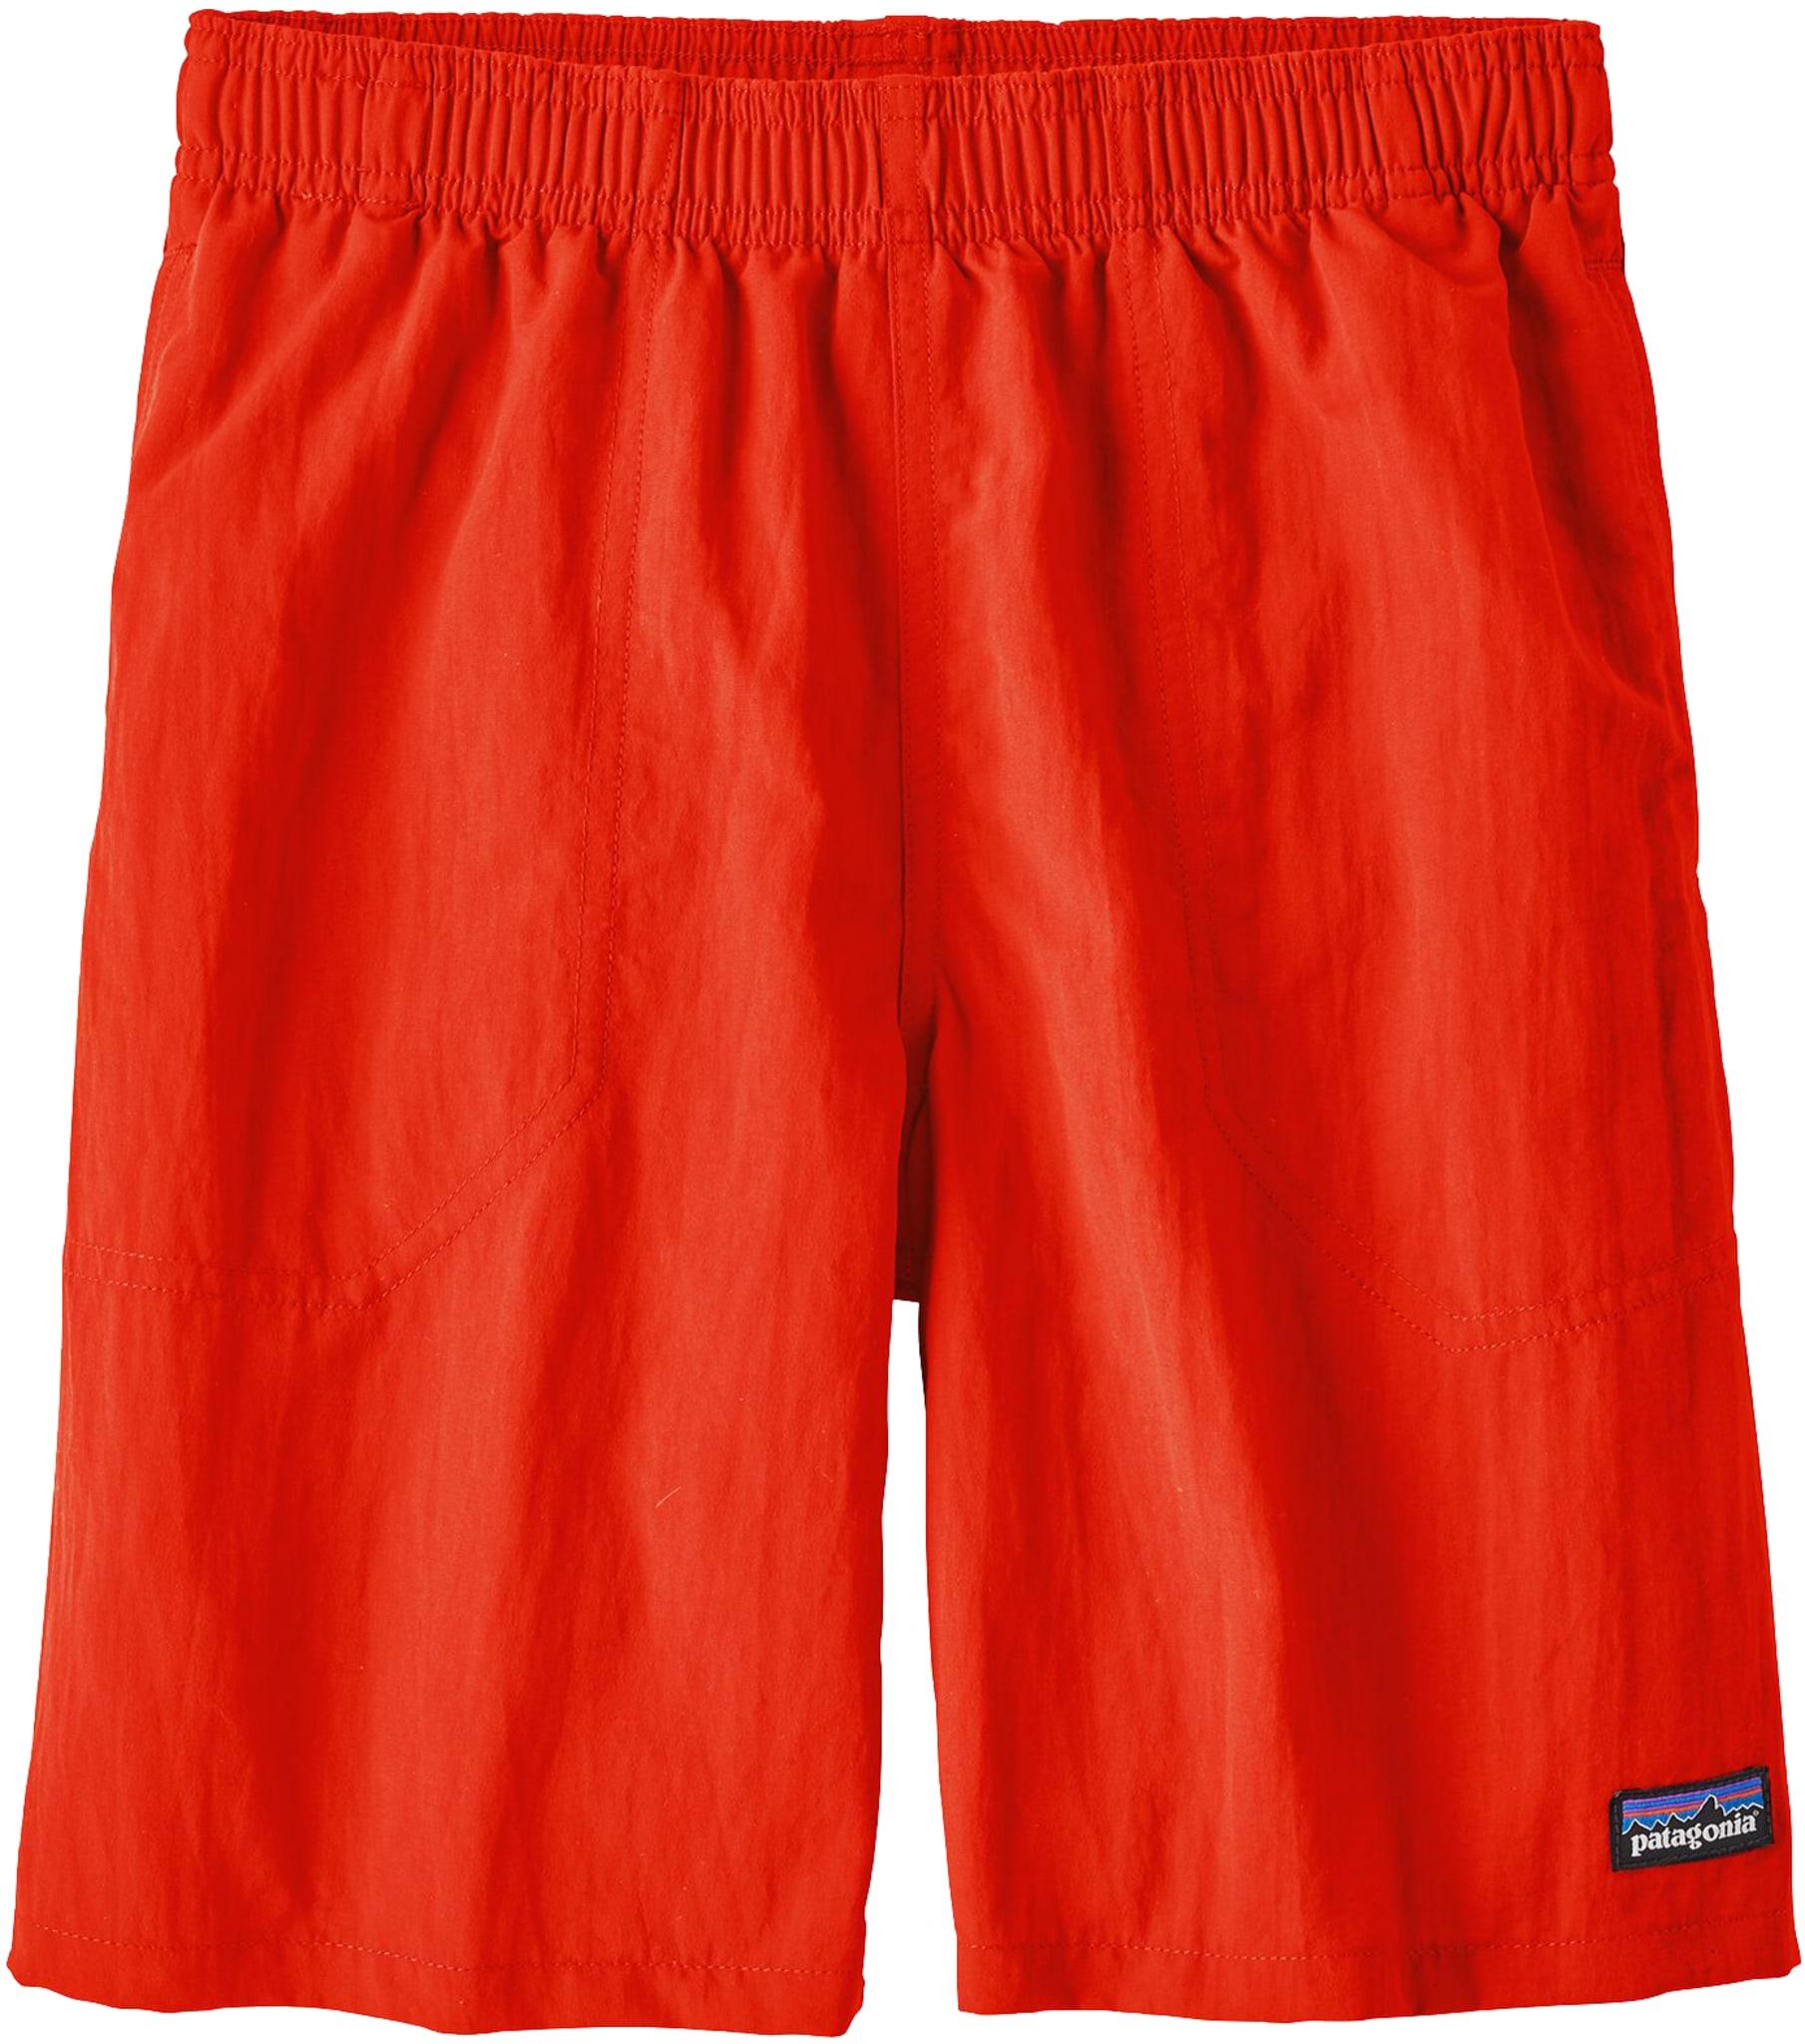 Baggies Shorts Boys'